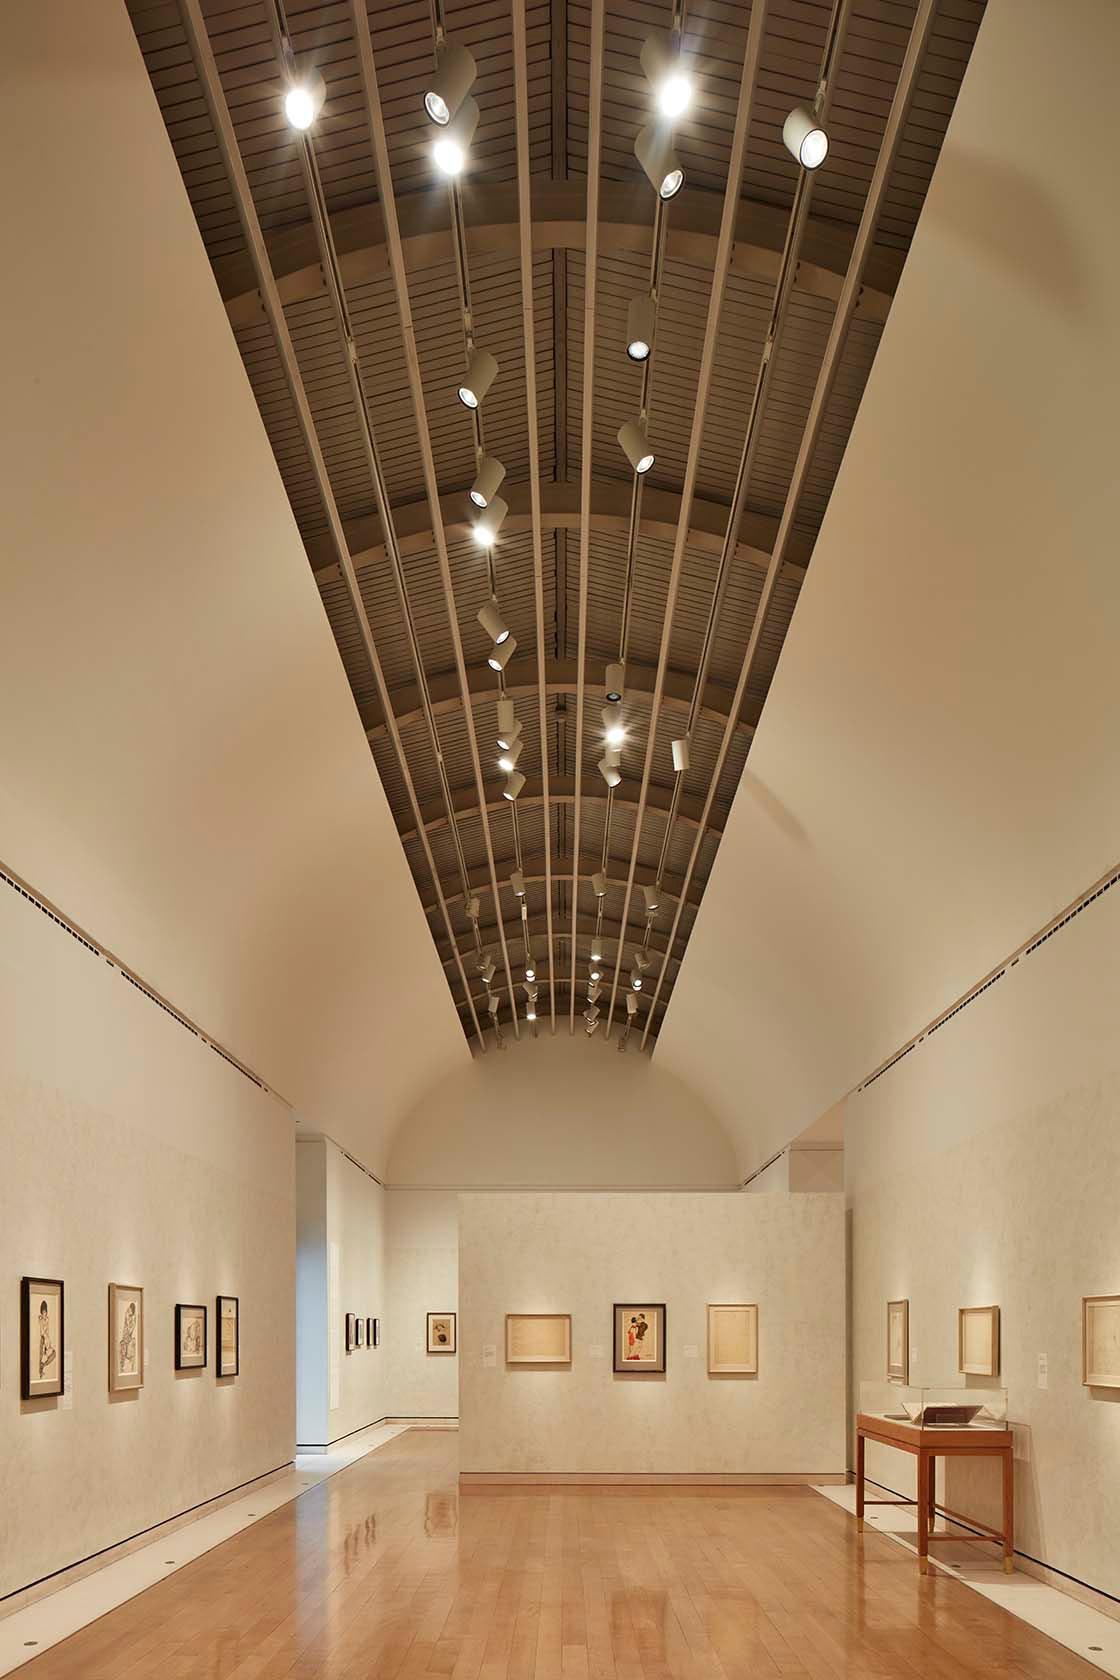 D Exhibition In London : Klimt schiele exhibition royal academy london ed reeve